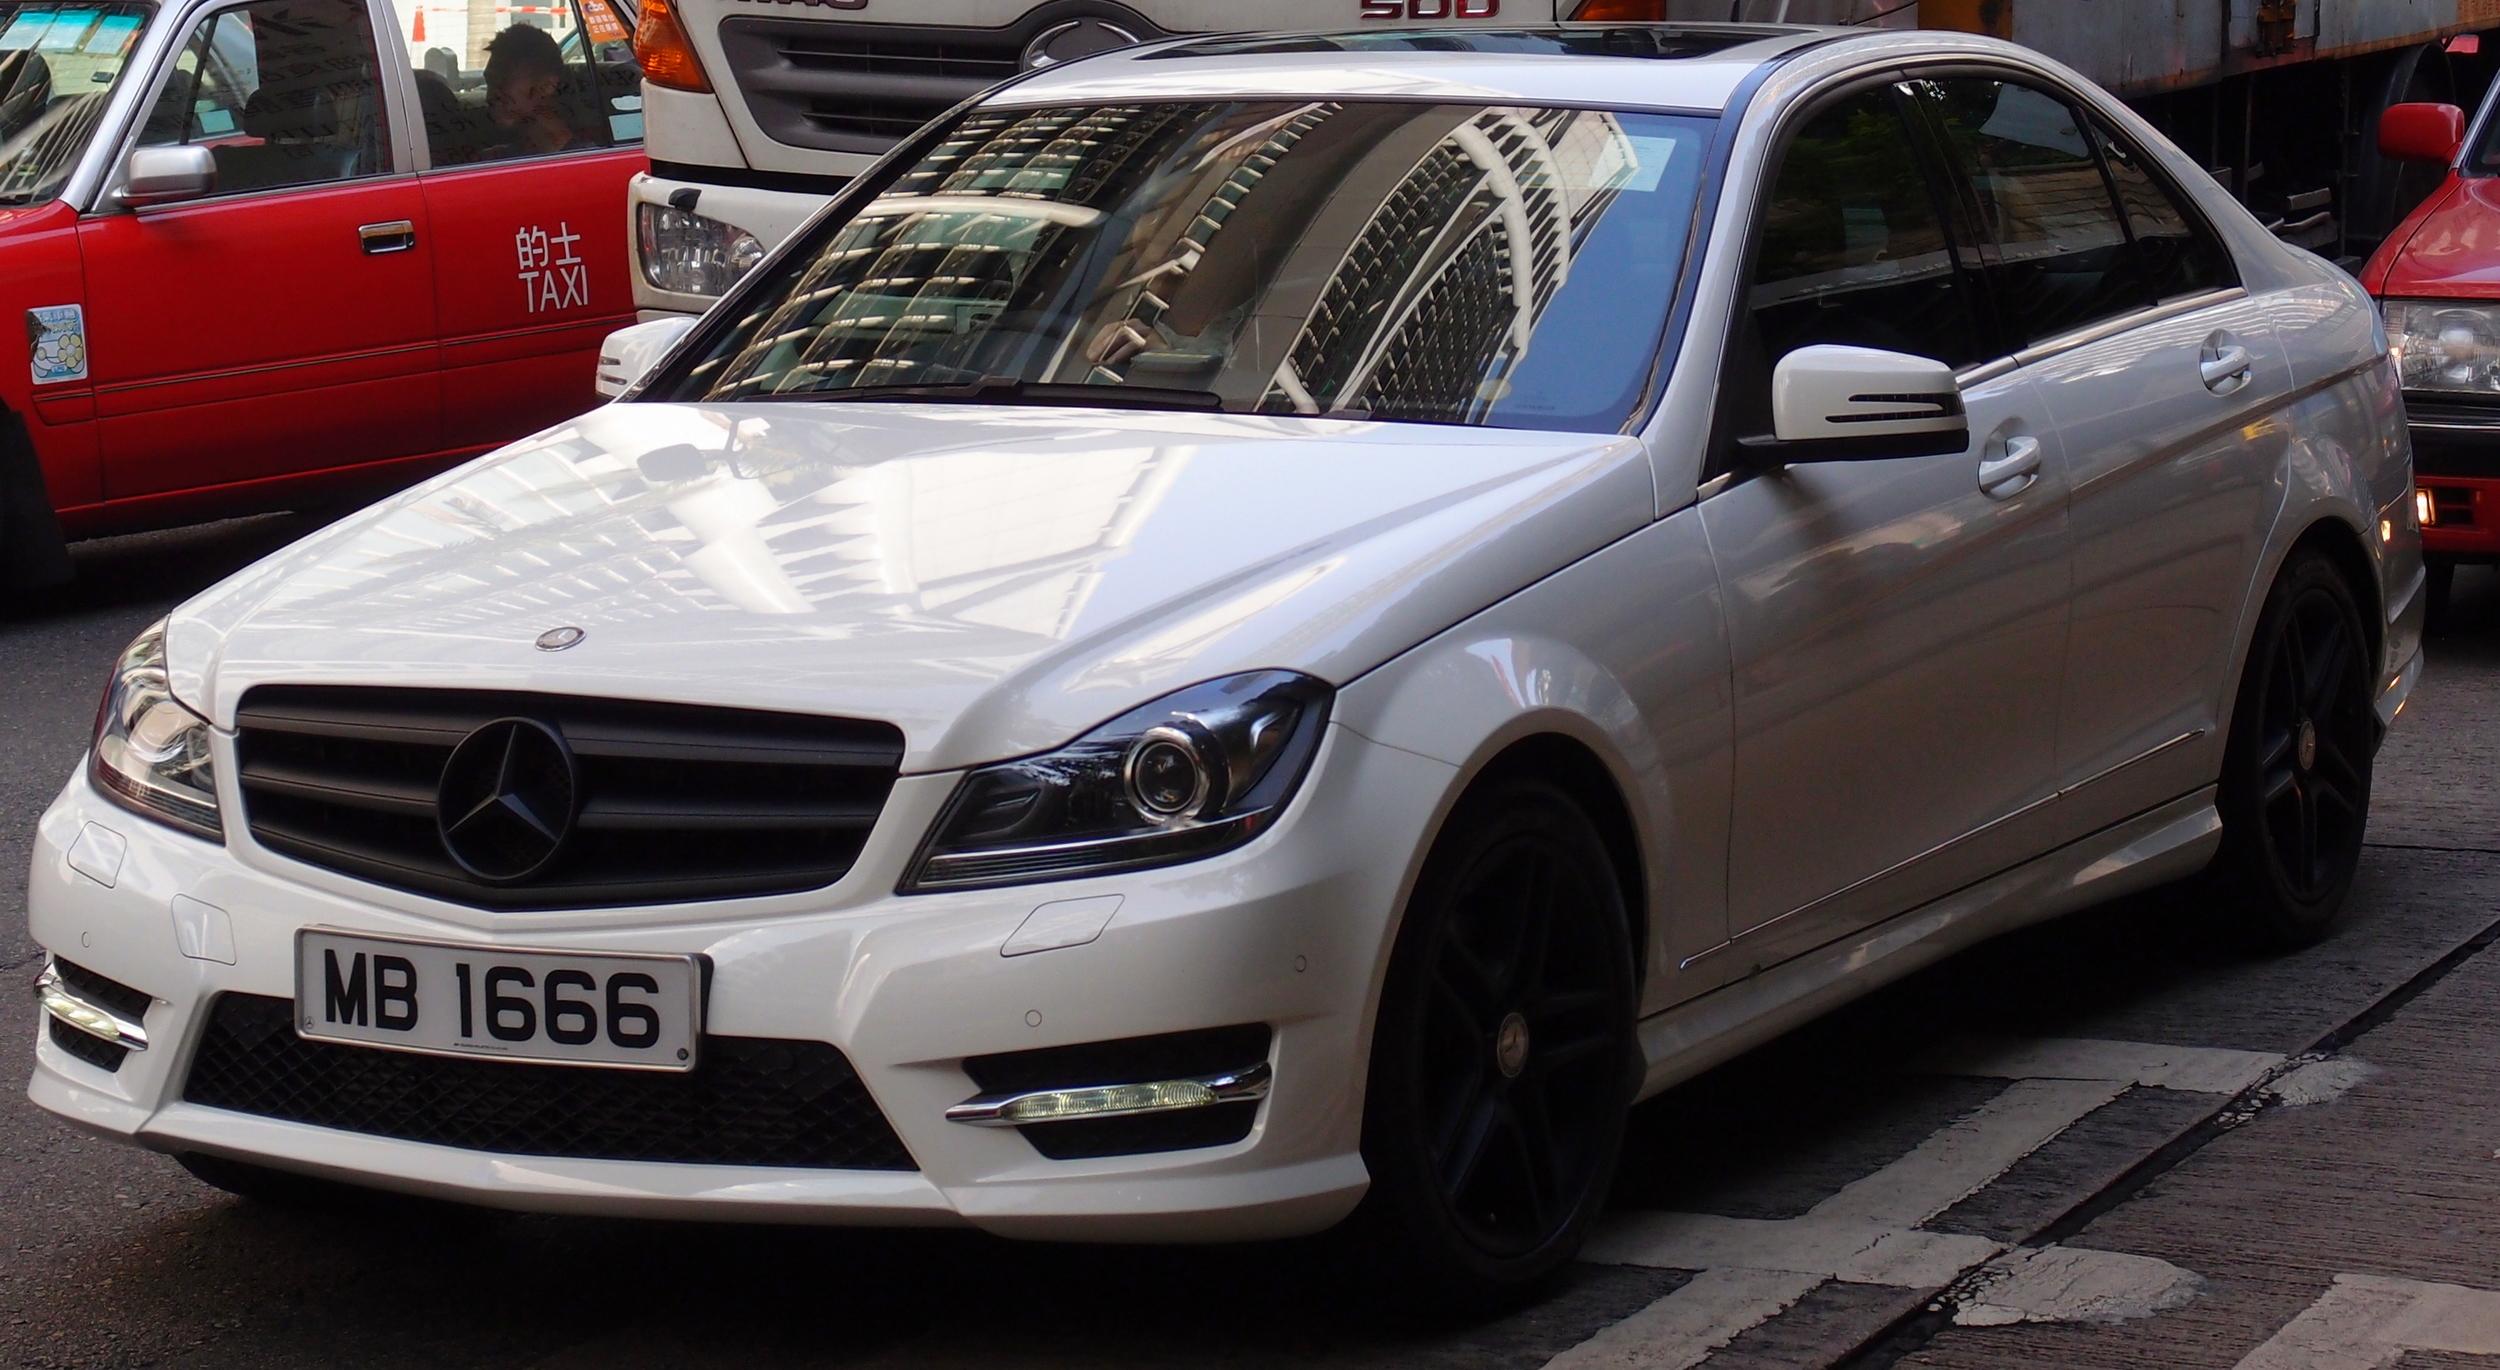 A racy Mercedes Benz